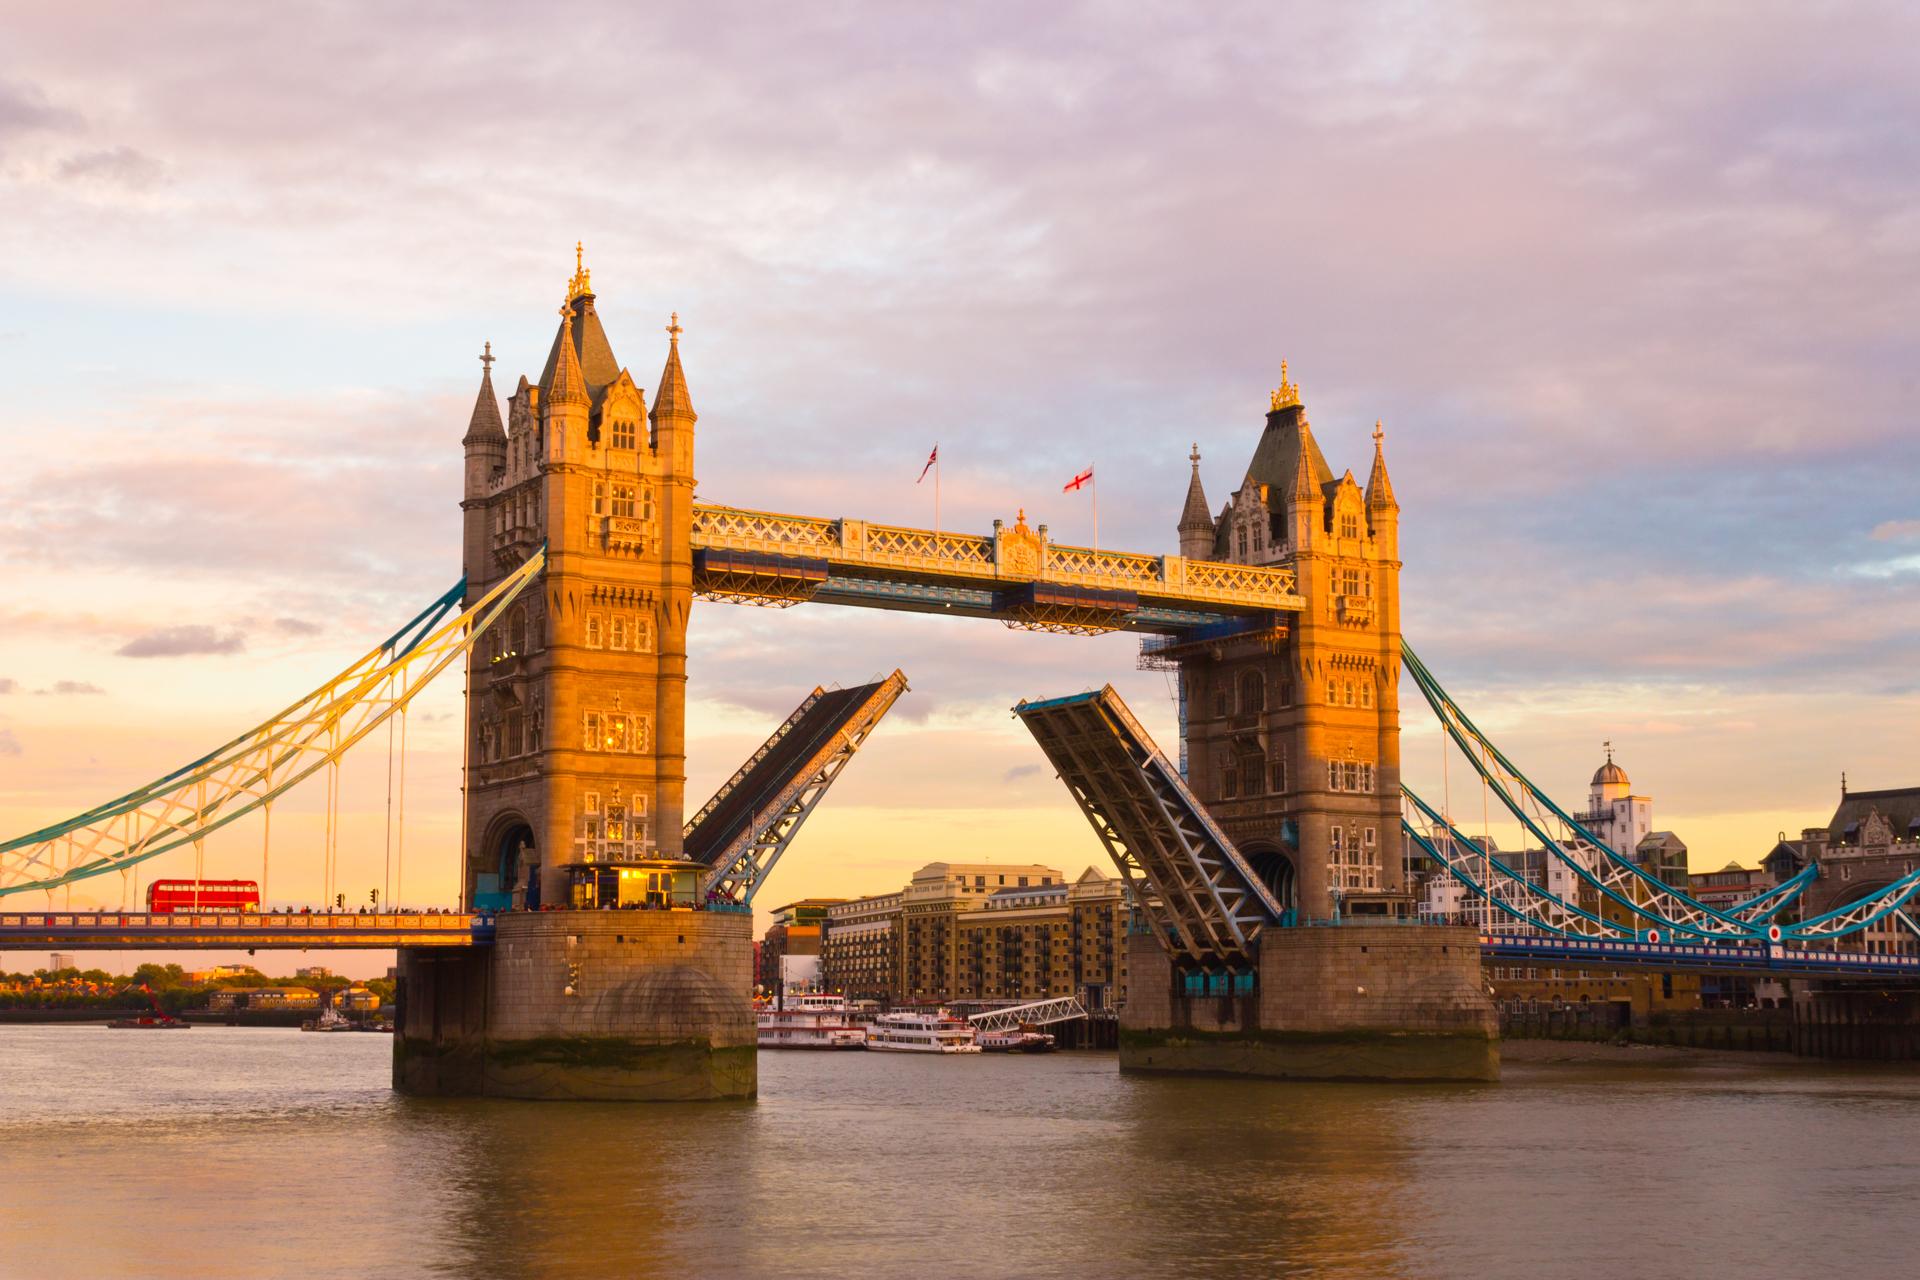 Tower Bridge at dusk in AdobeRGB color space